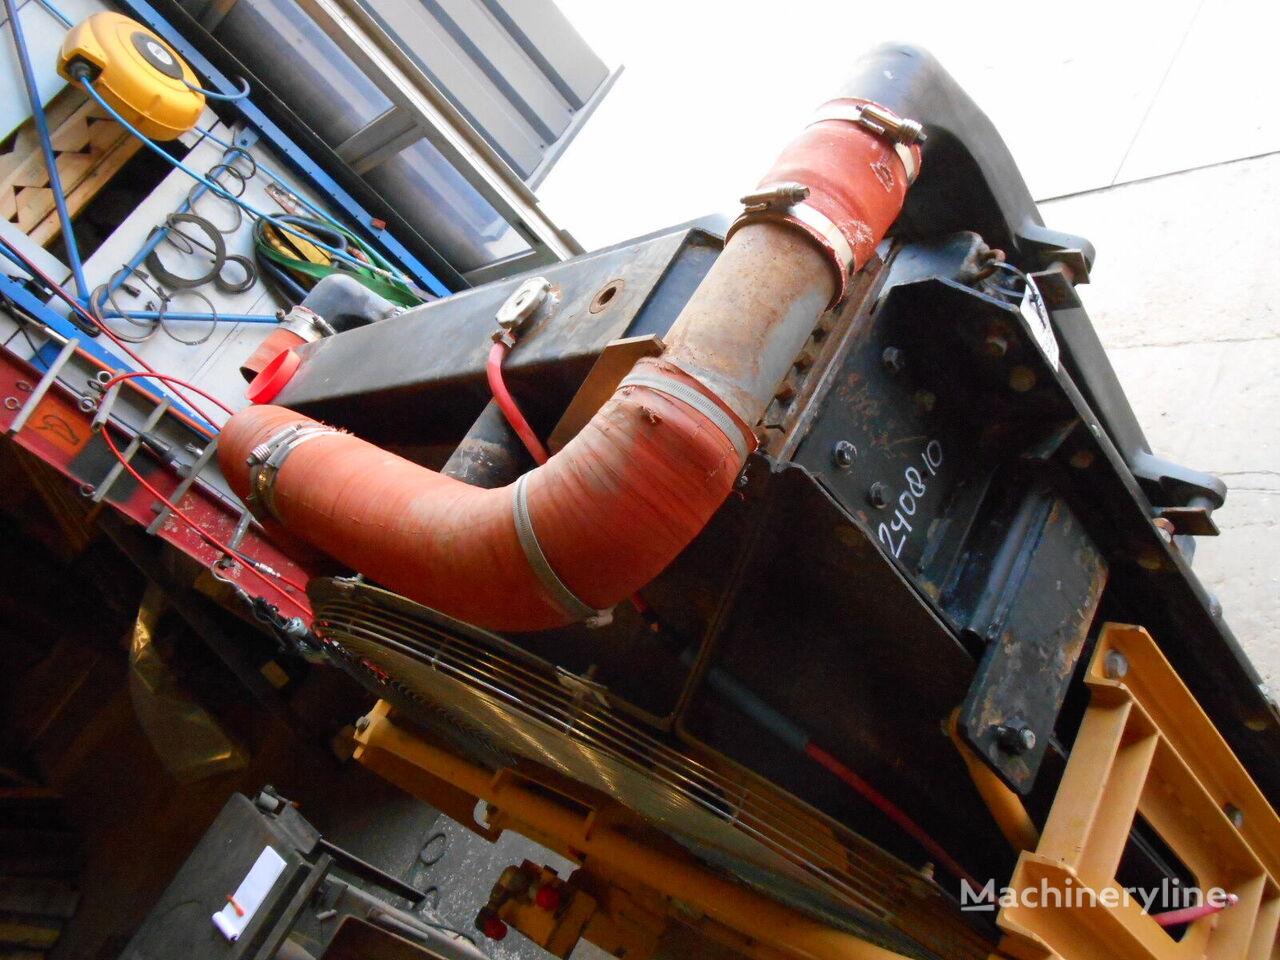 CATERPILLAR 365BL motorkoeling radiator voor CATERPILLAR 365BL graafmachine